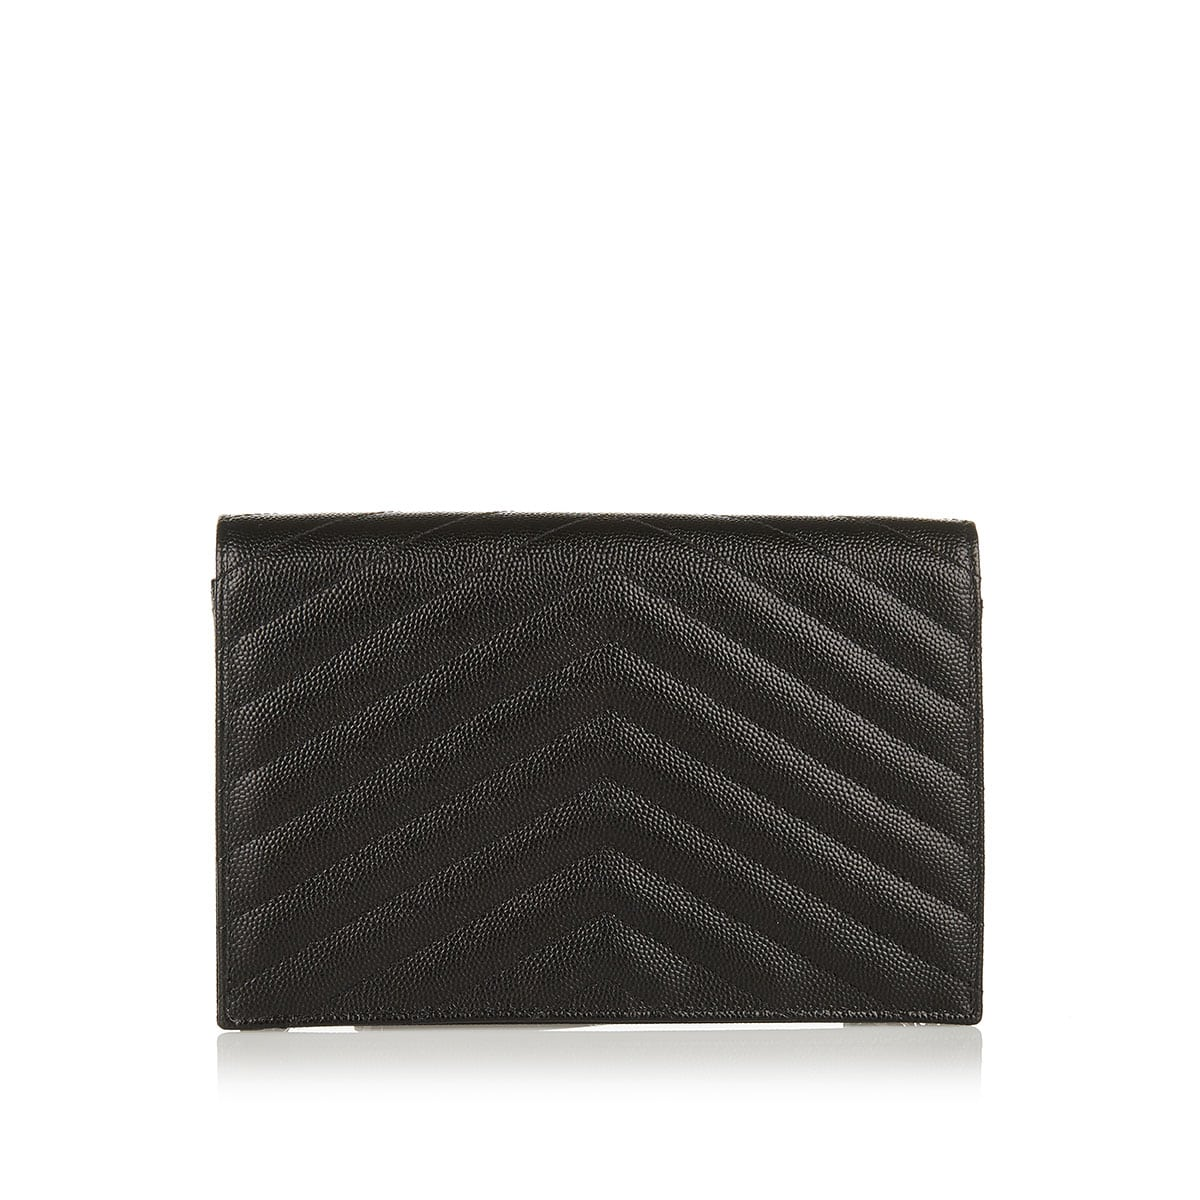 Monogram envelope chain wallet